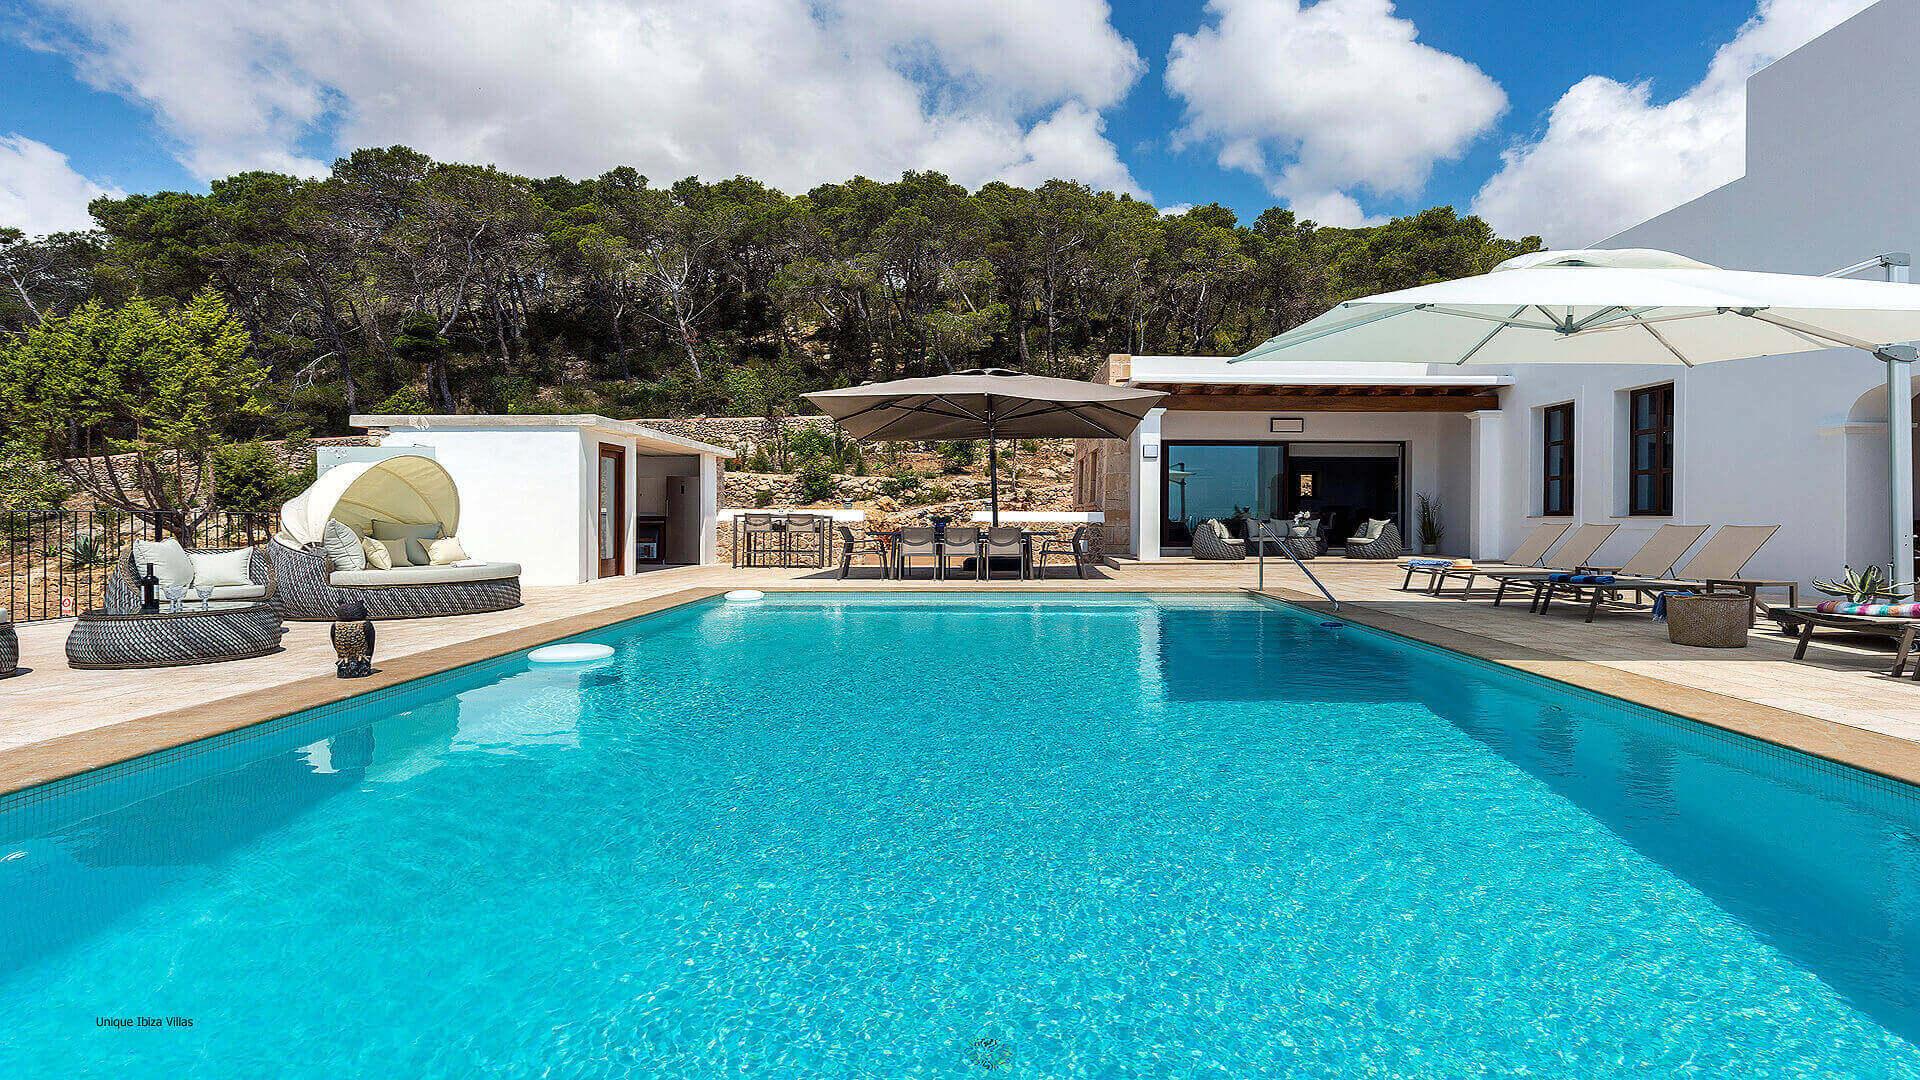 Casa Prats Ibiza 2 Santa Eulalia